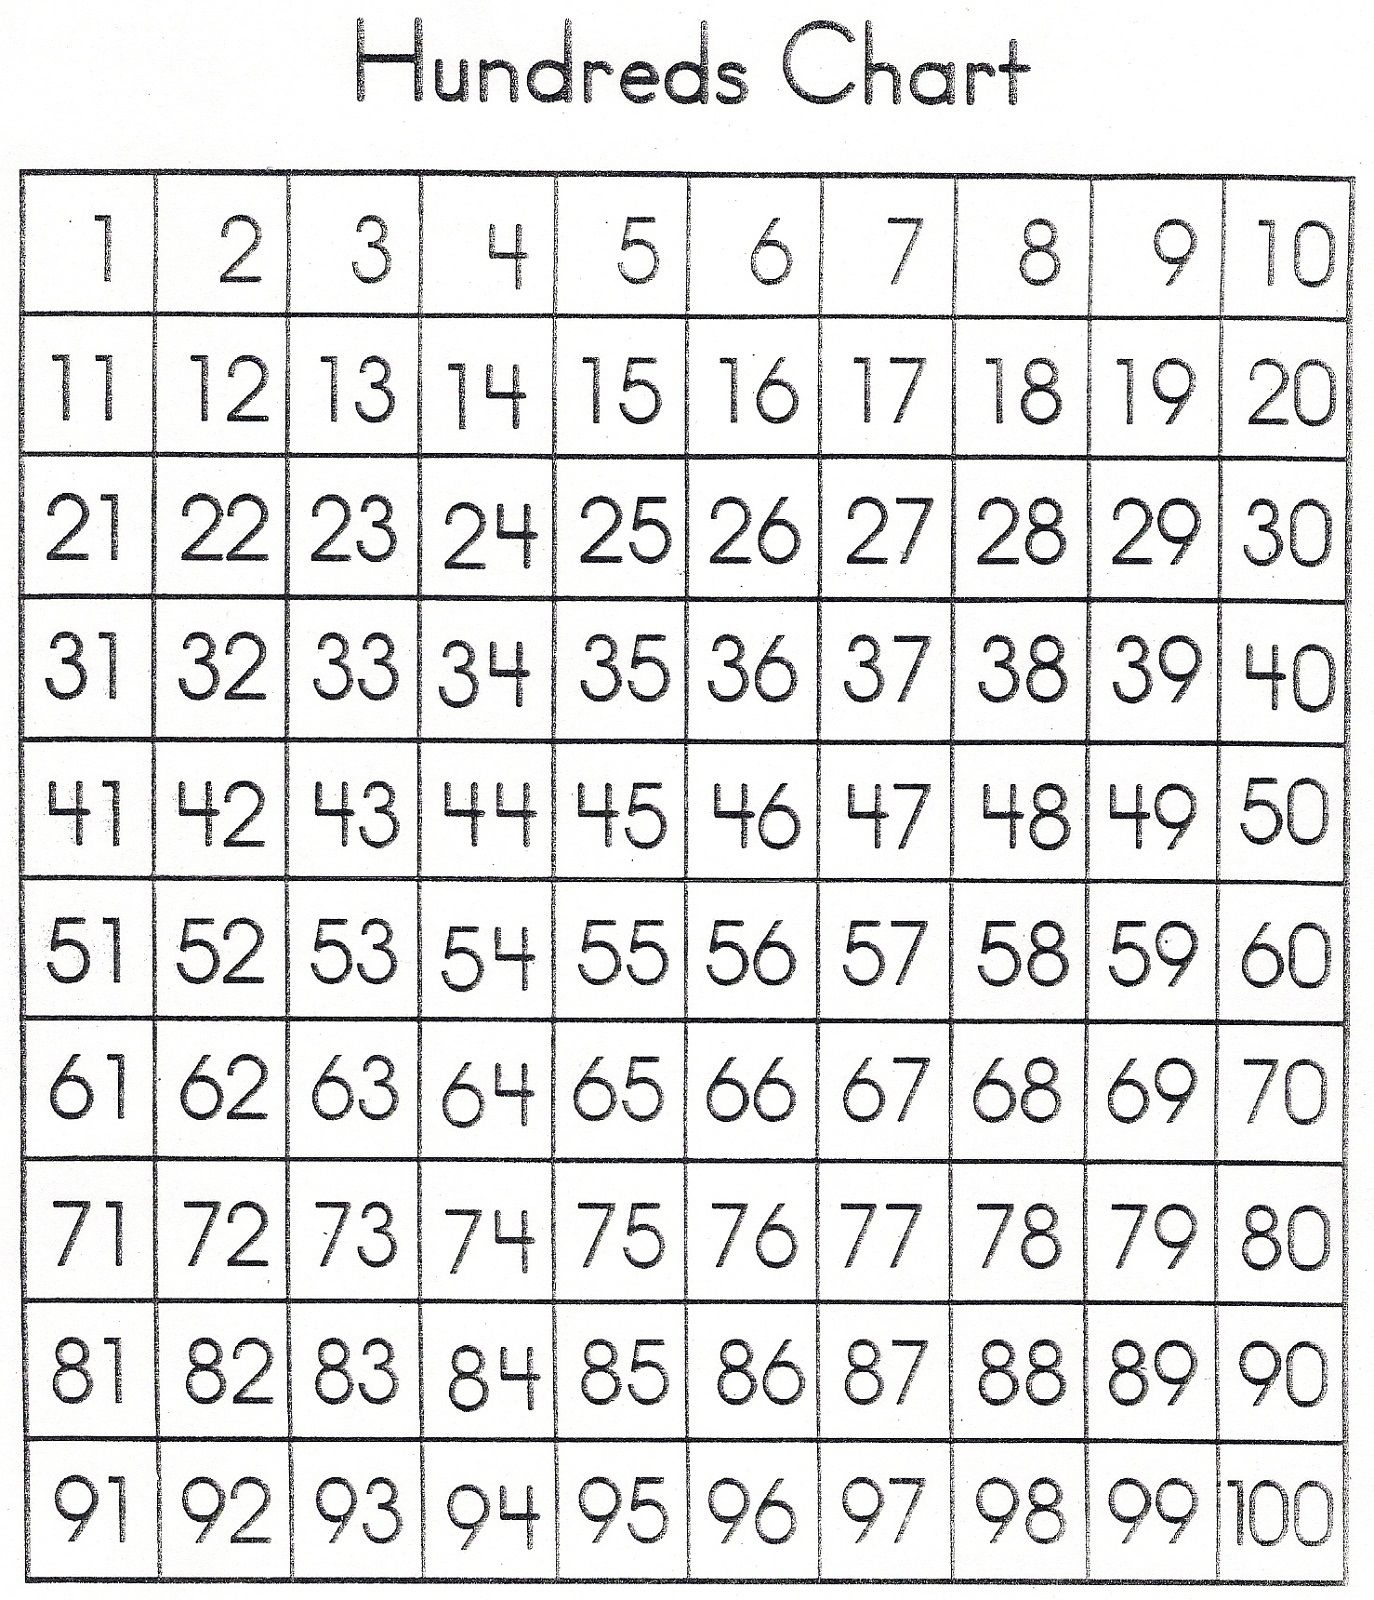 Number Sheet 1-100 To Print   Math Worksheets For Kids   100 Number - Free Printable Number Worksheets 1 100